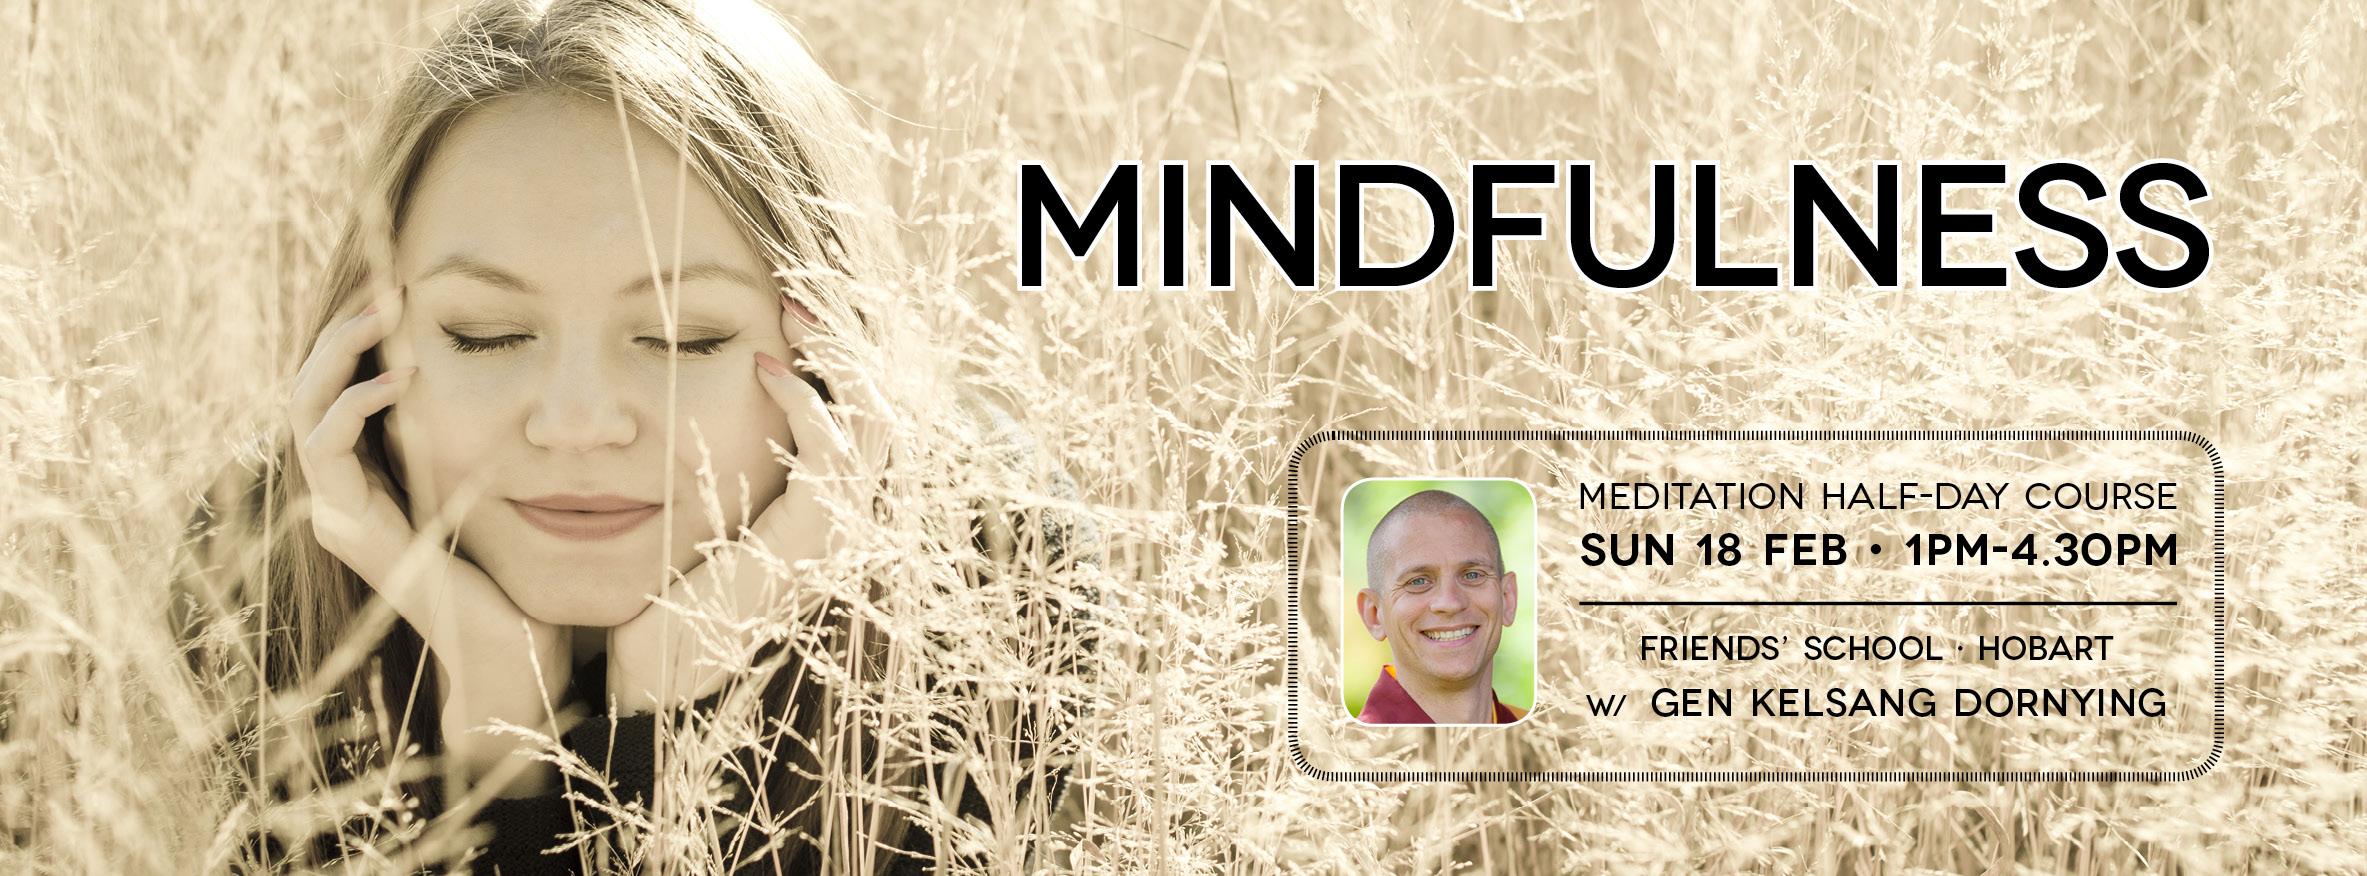 Mindfulness web ad 2